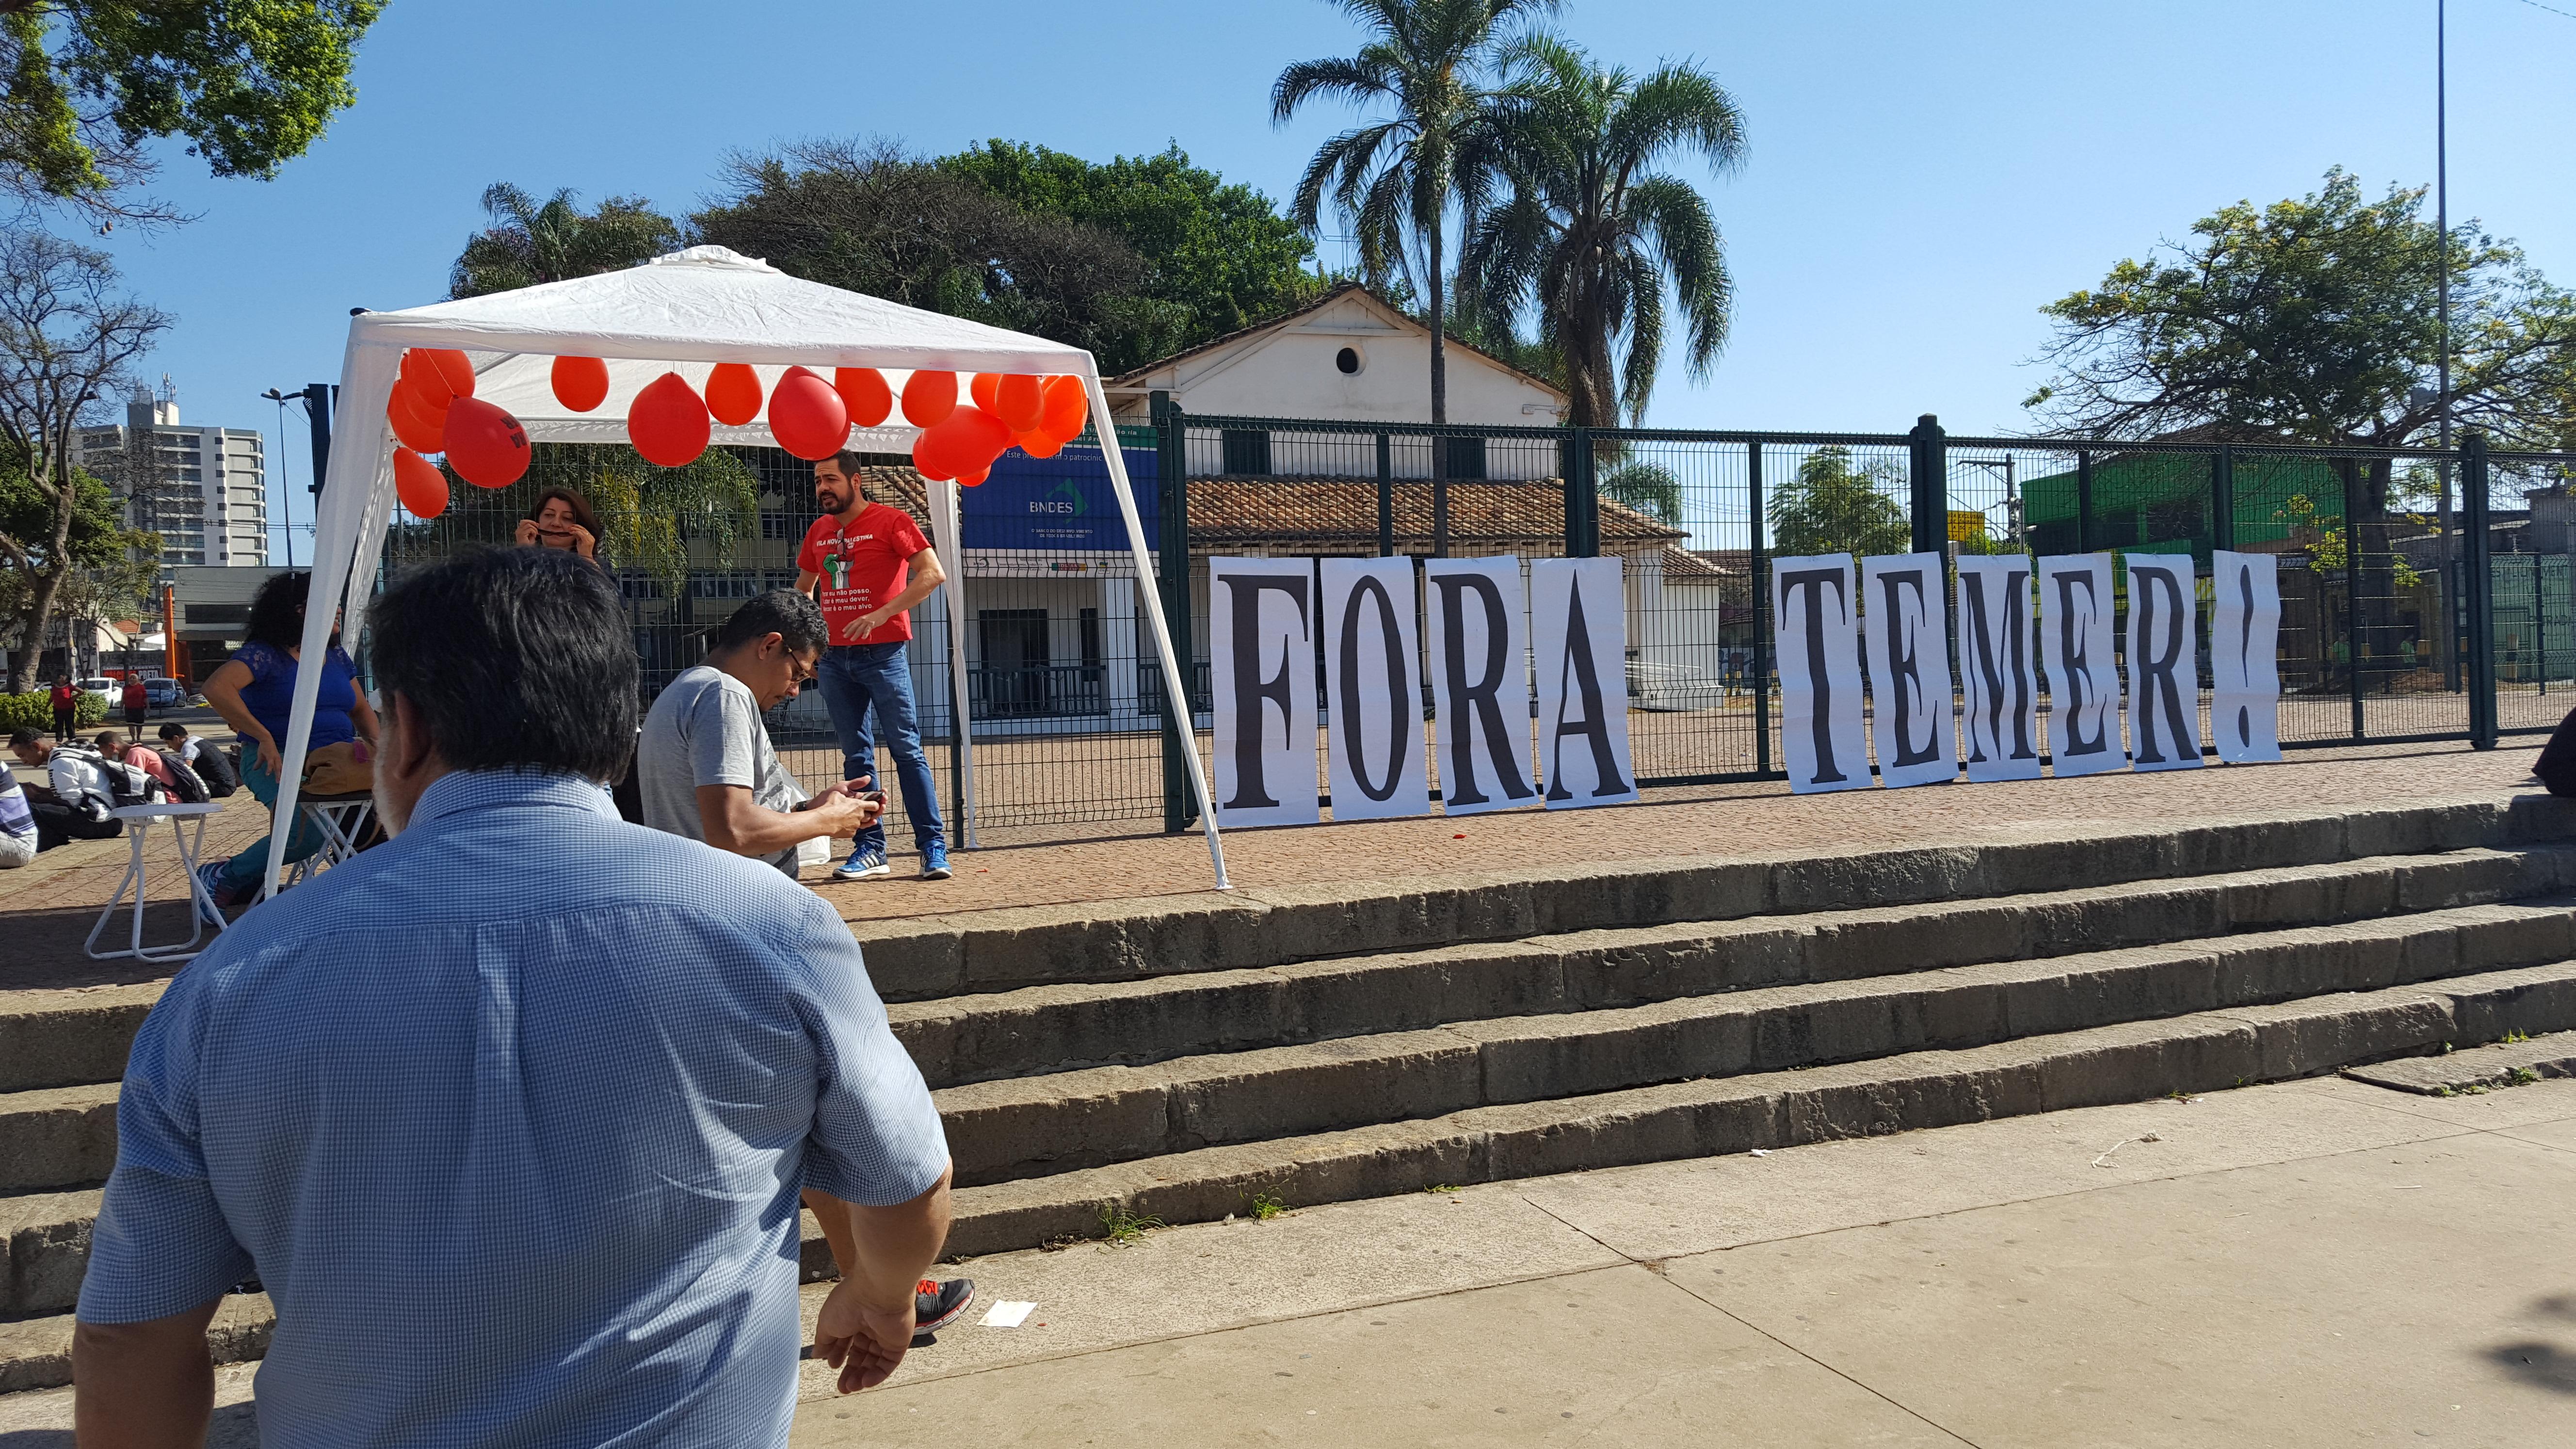 marcio_fora_temer_pça_forró